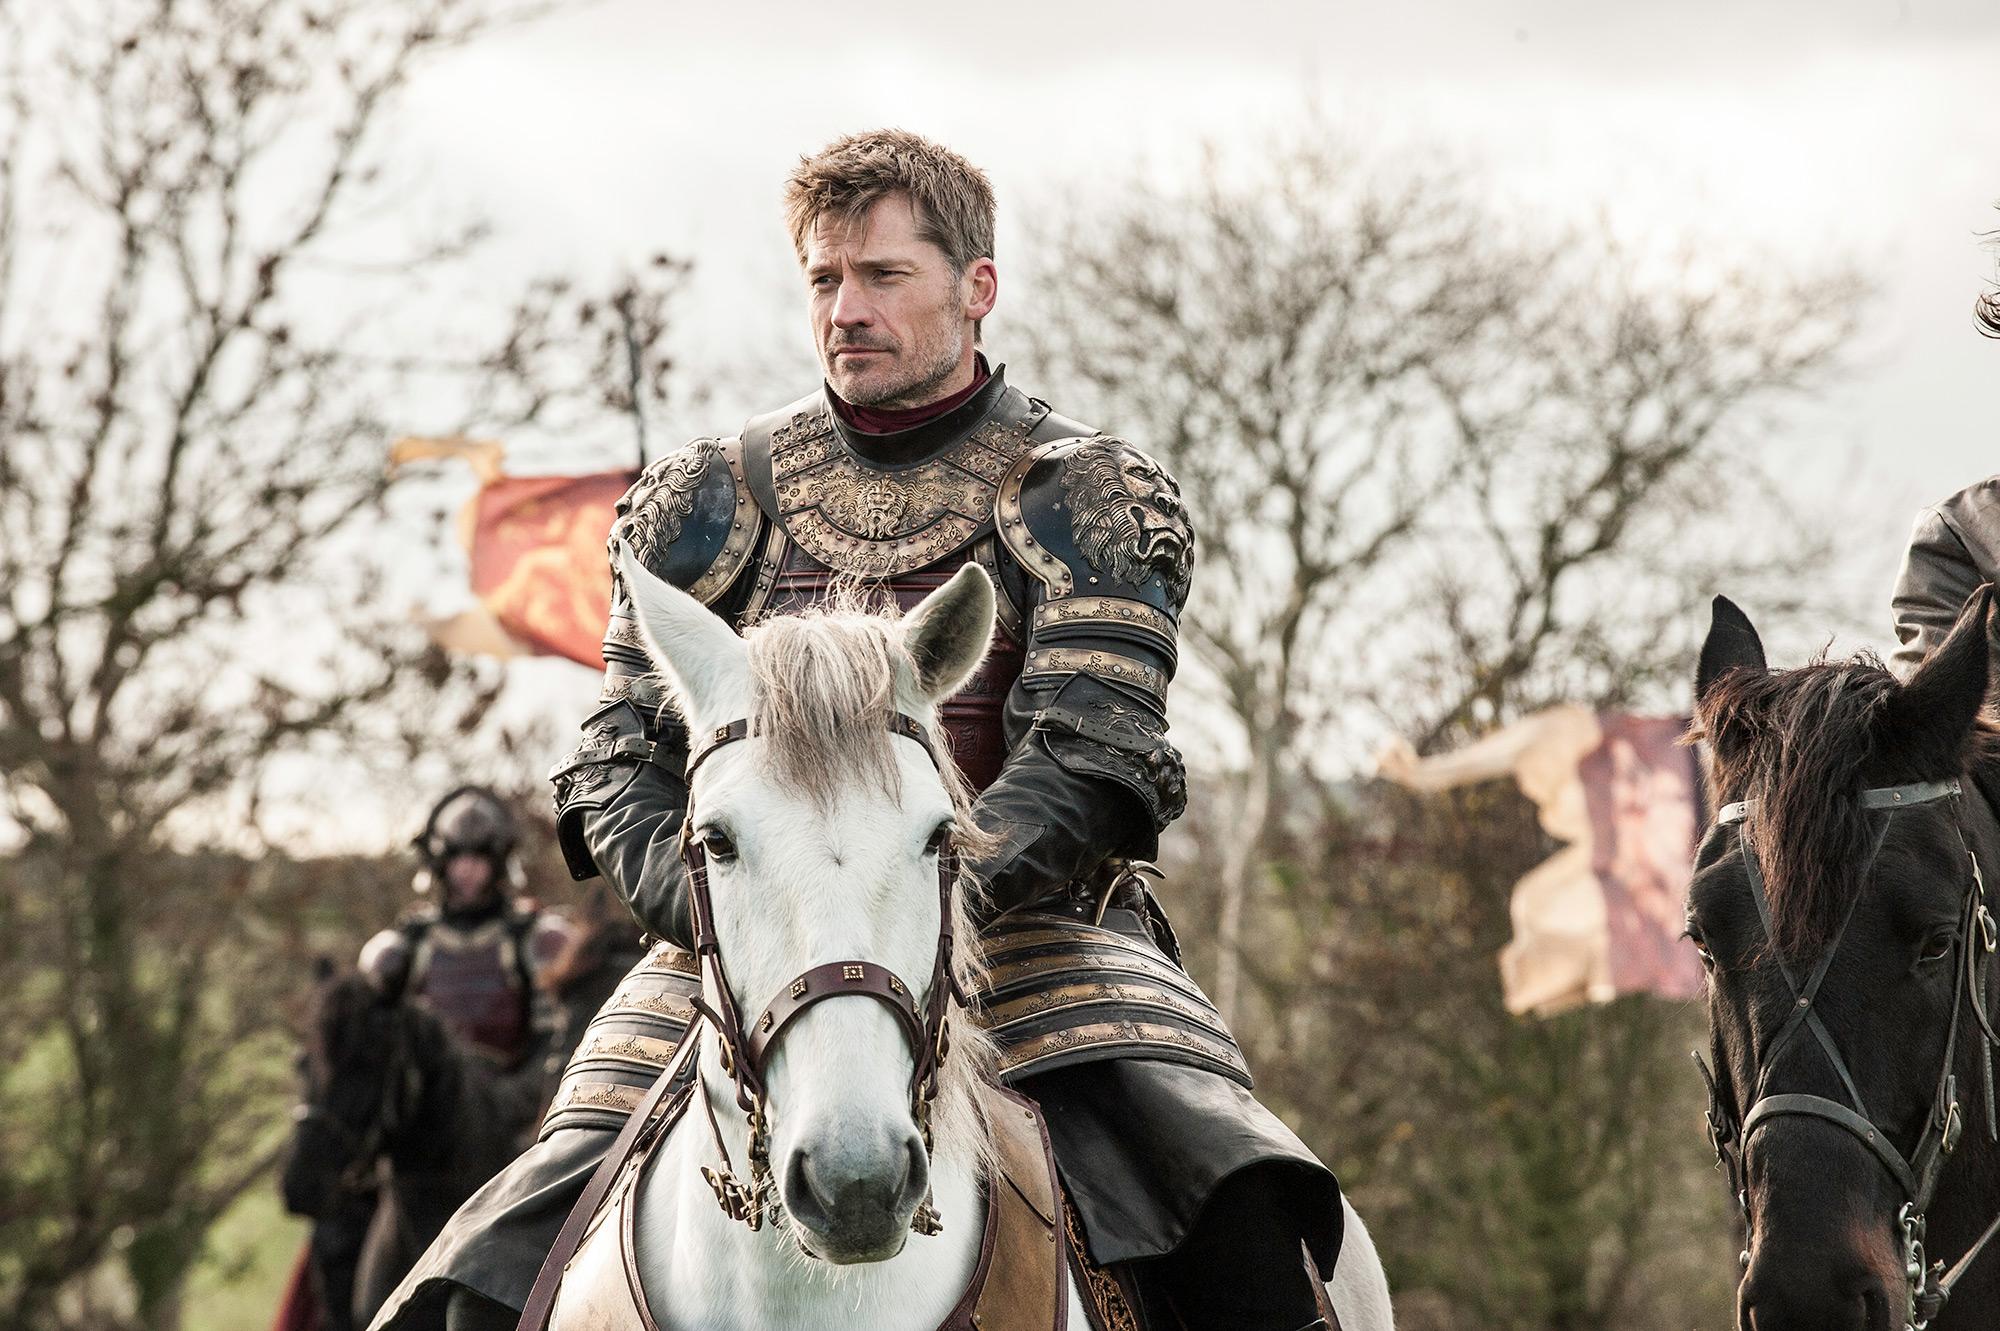 Jaime-Lannister-456